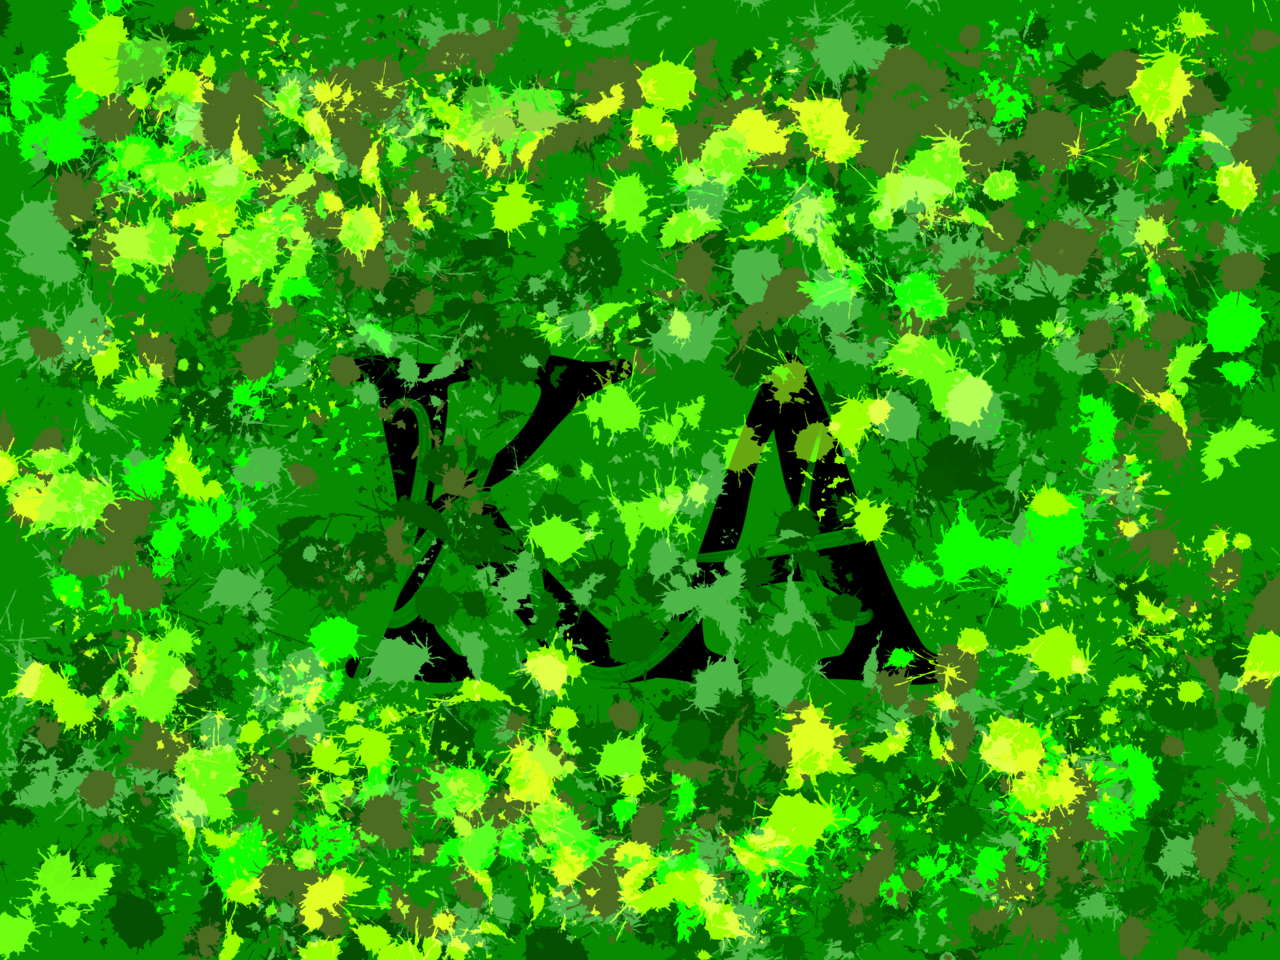 KA Illust of KA May2021_Monochrome 芸術 original KA green